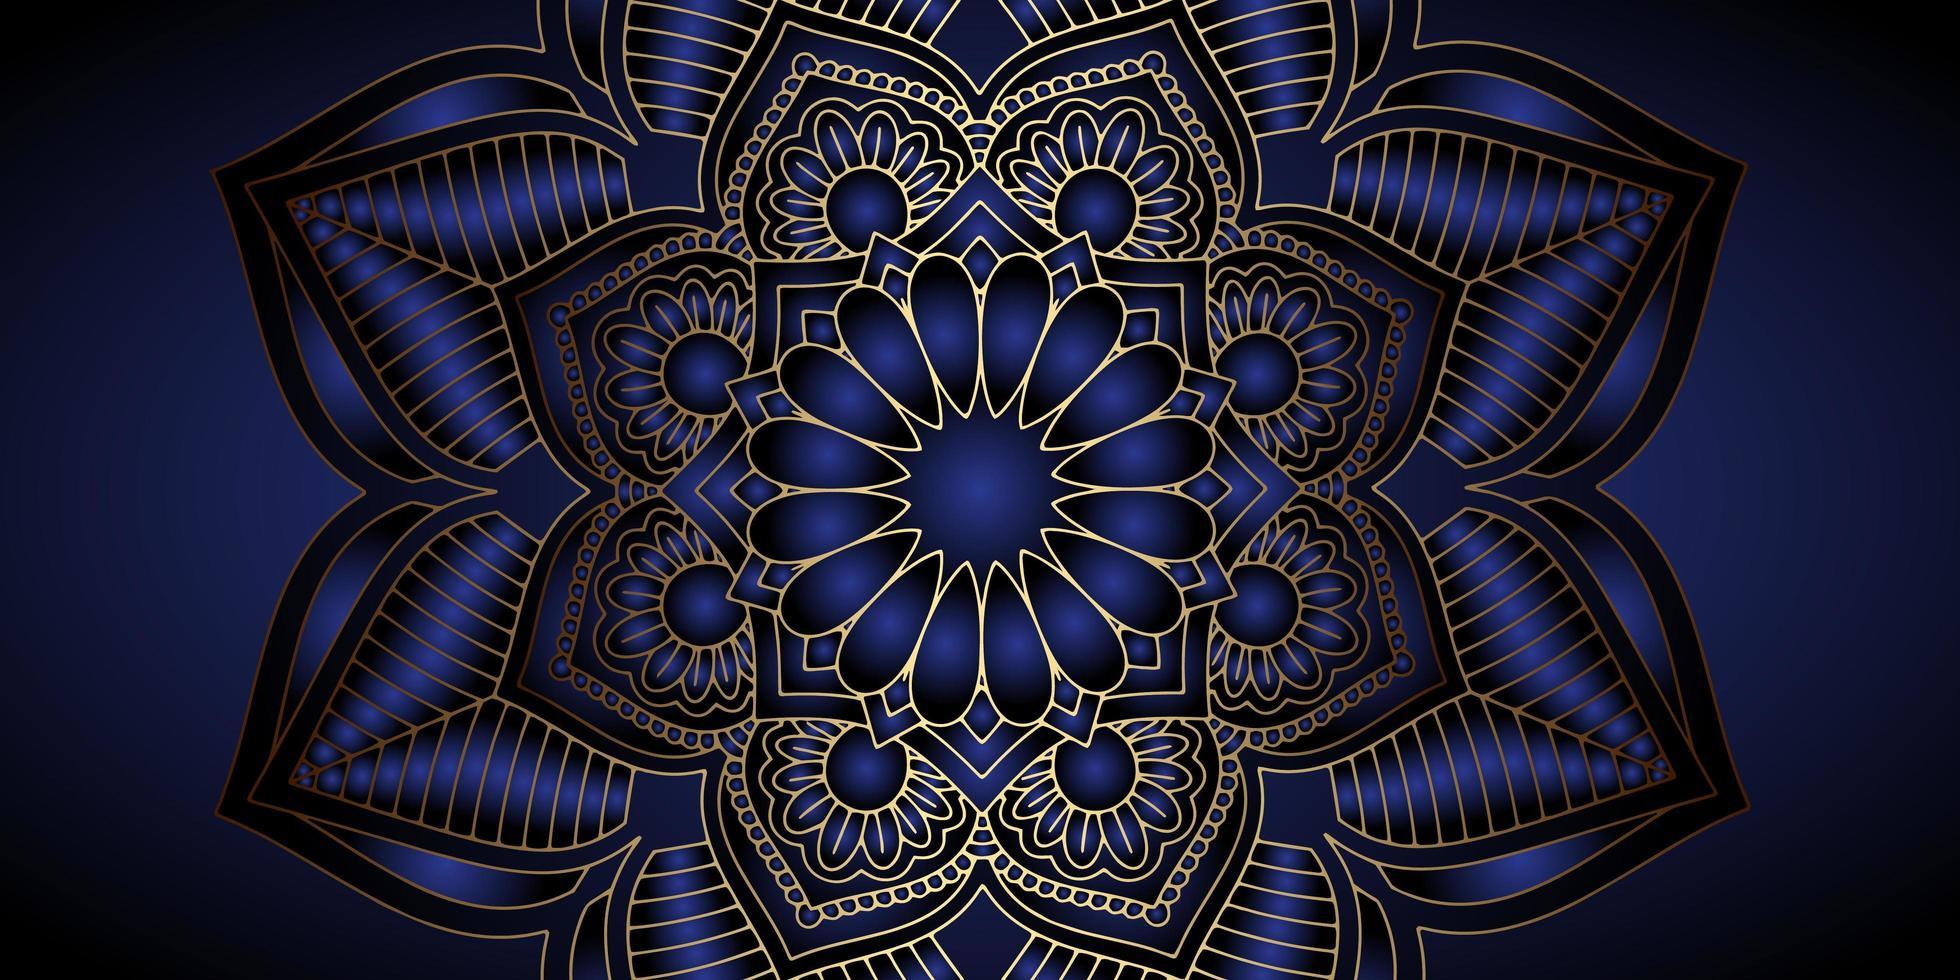 Dekorativ mandala banner design vektor